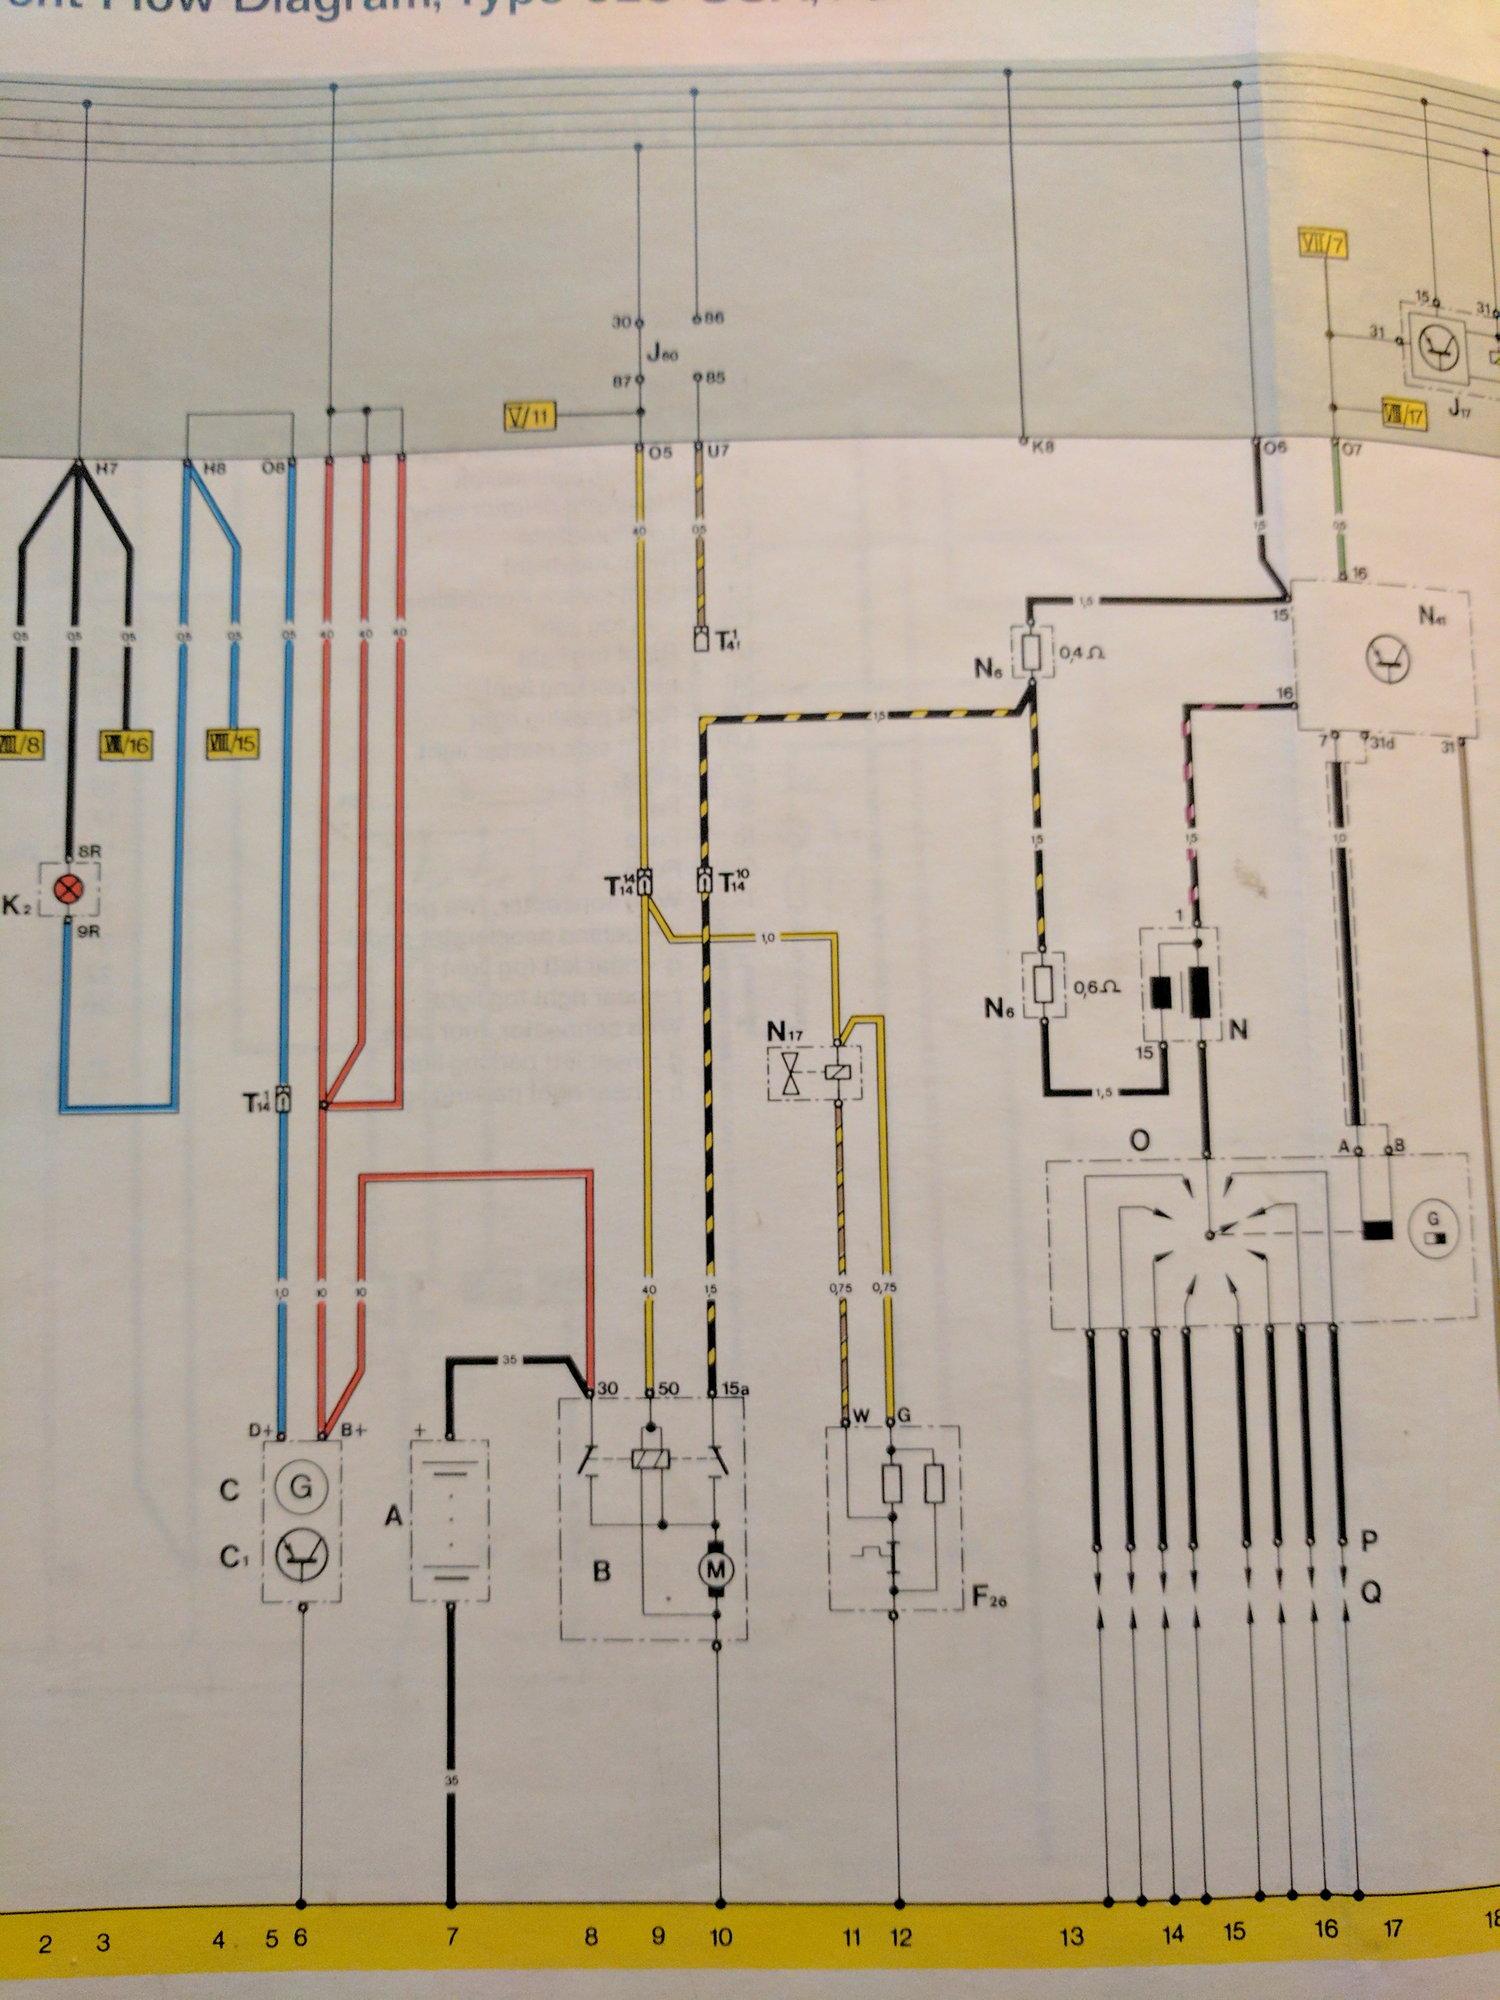 '79 Manual: Ignition Switch Problem? - Rennlist - Porsche Discussion Forums